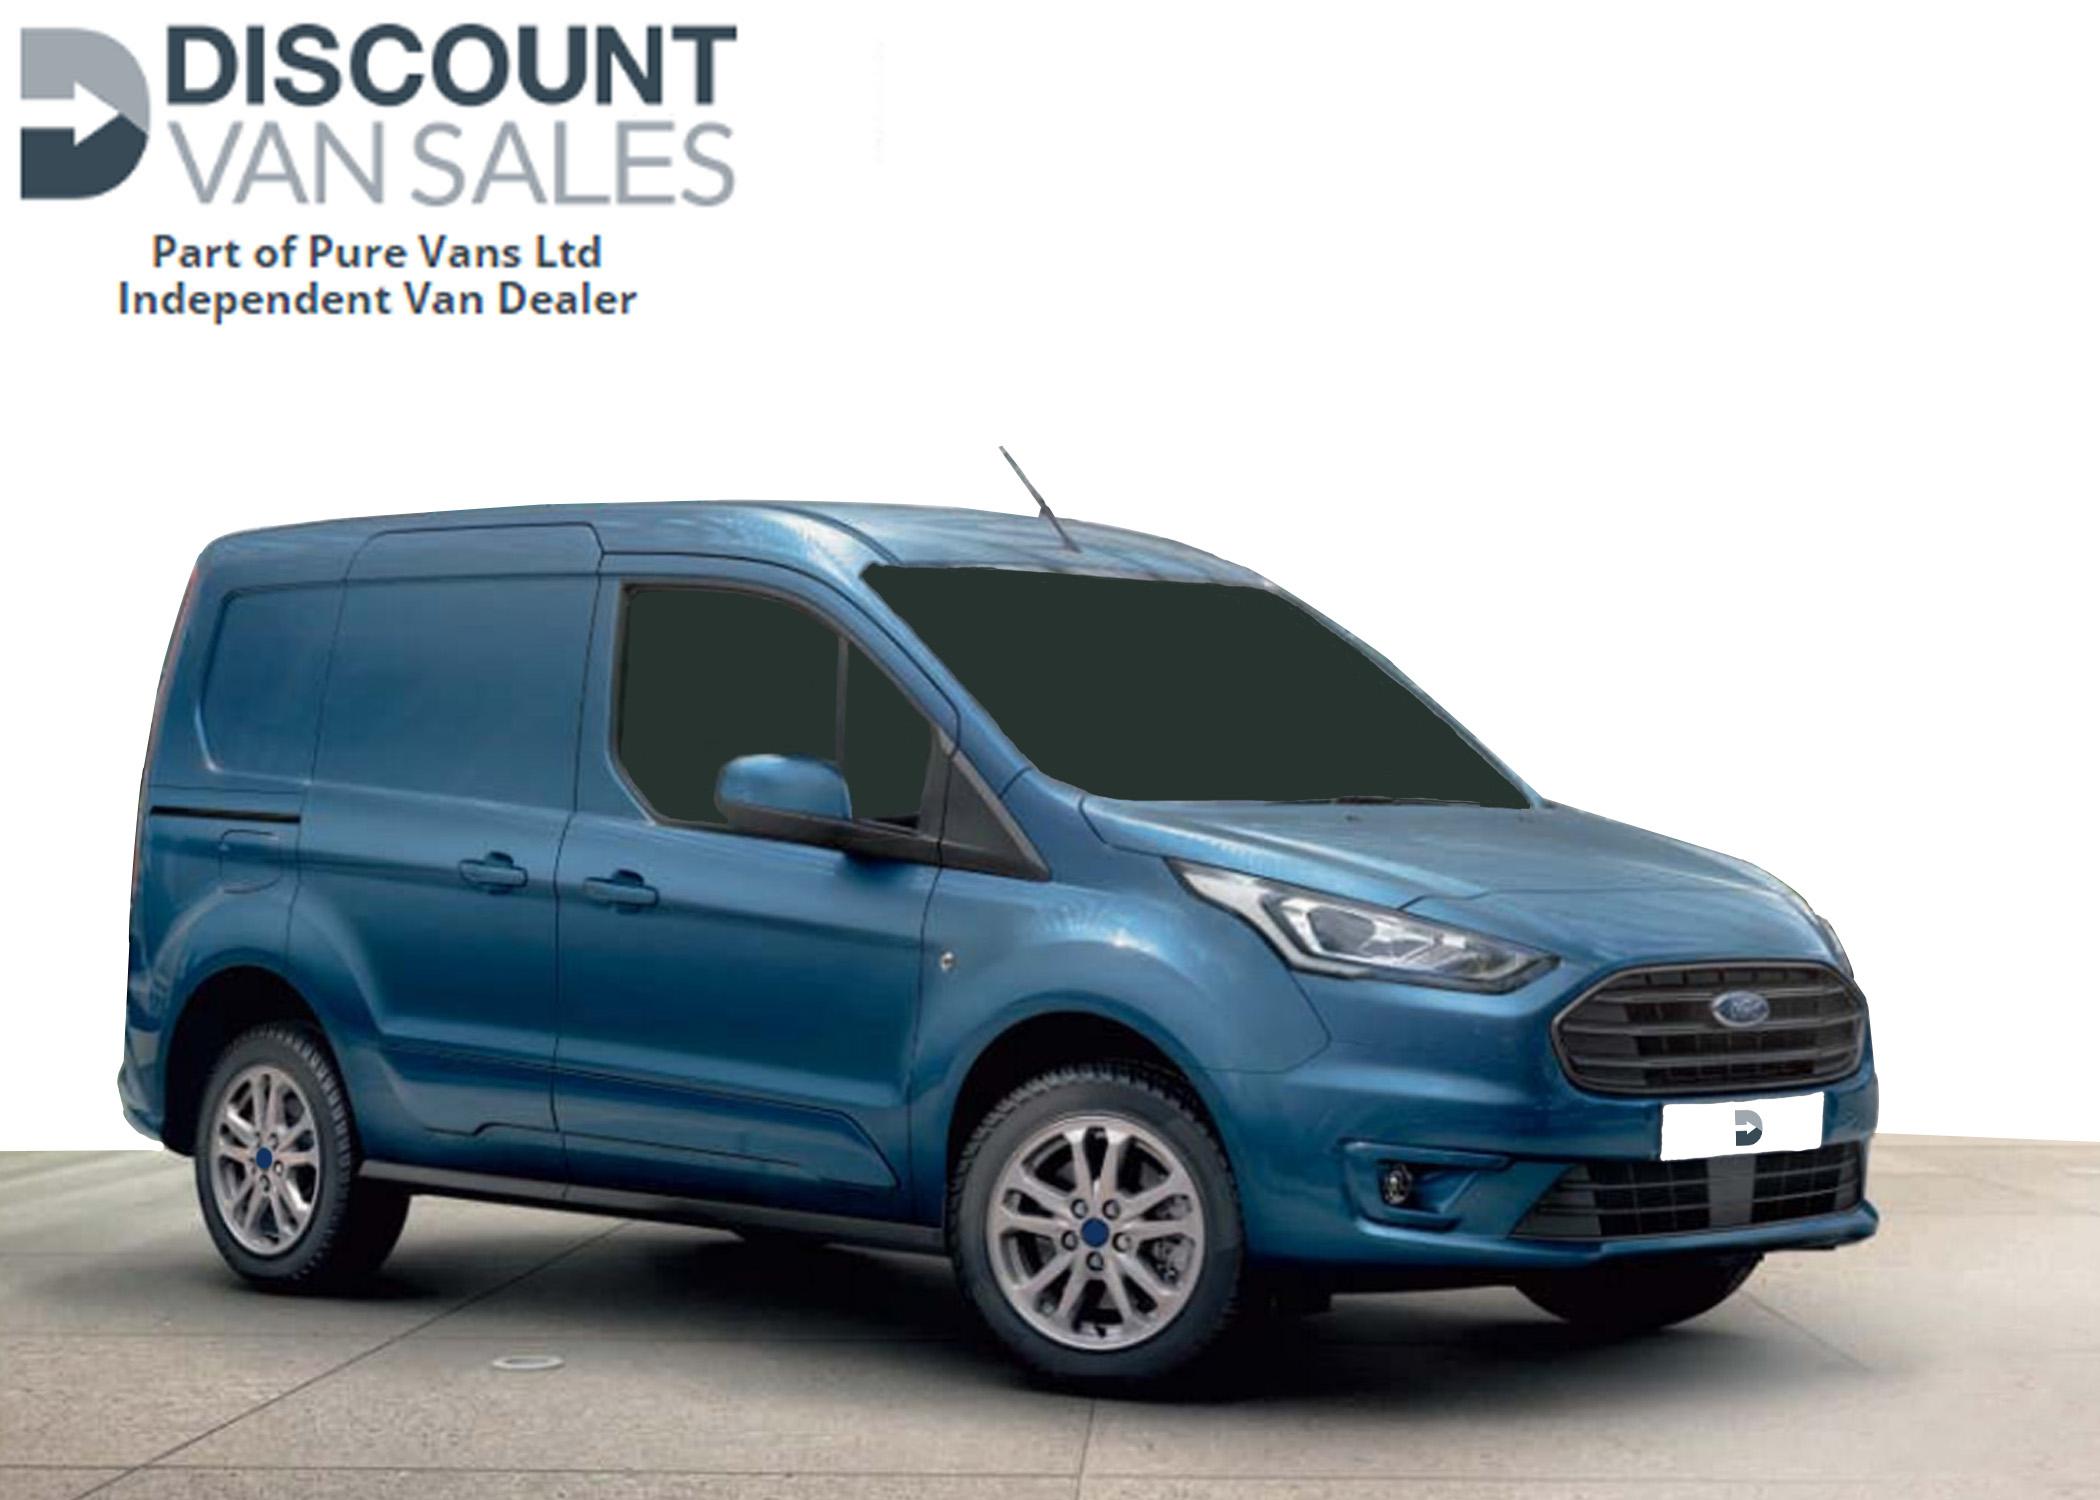 4c5ff86b6261ca Ford Van Stocklist - Discount Van Sales